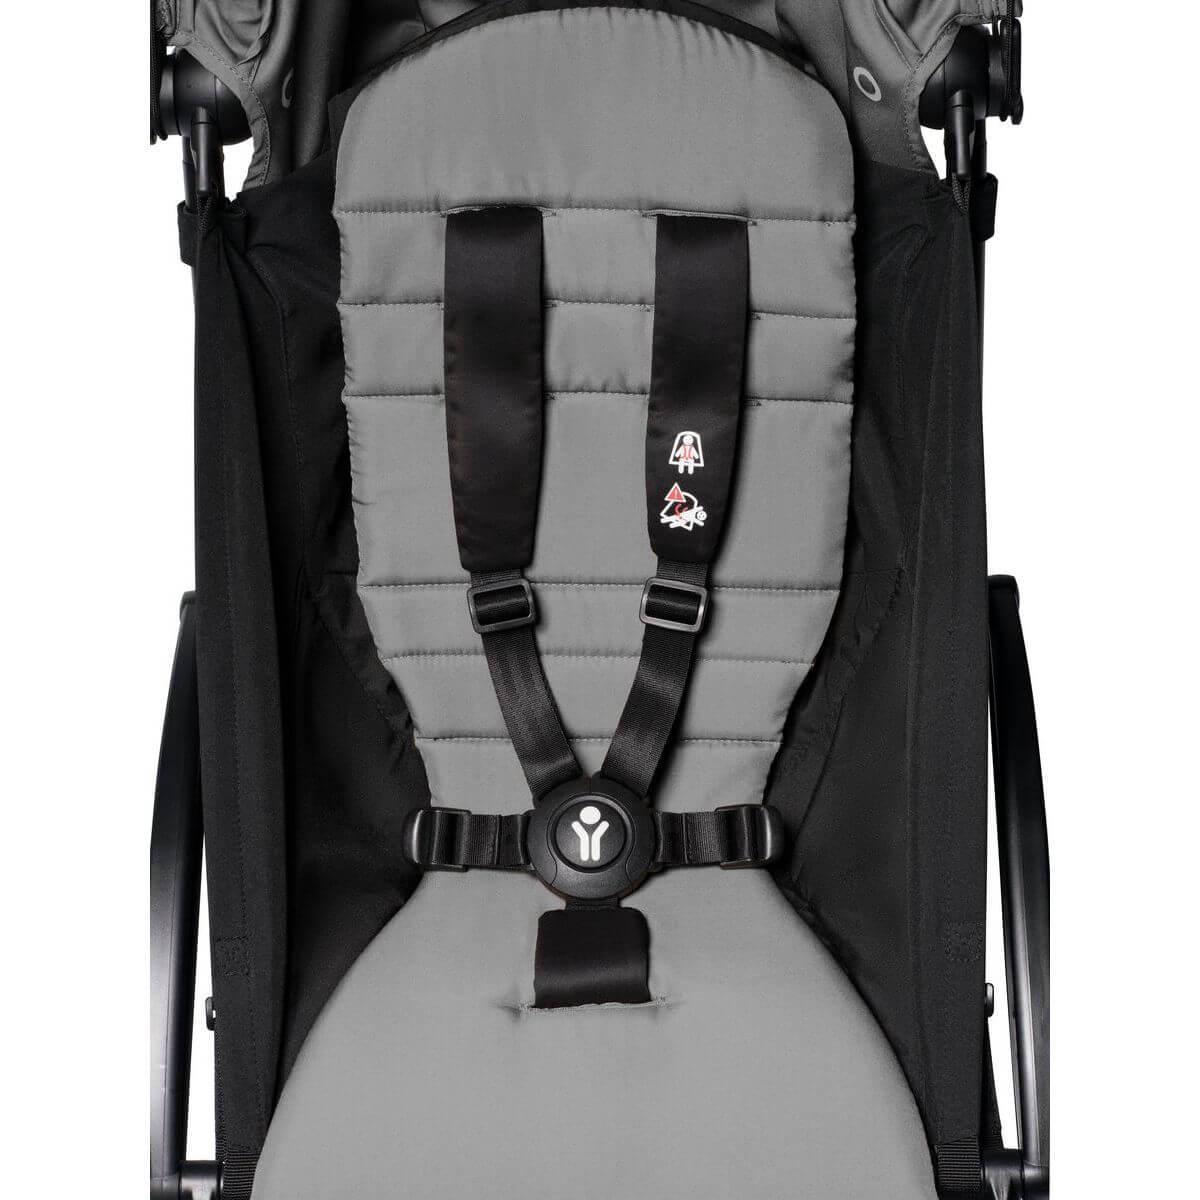 BABYZEN cochecito YOYO² 6+ negro-gris